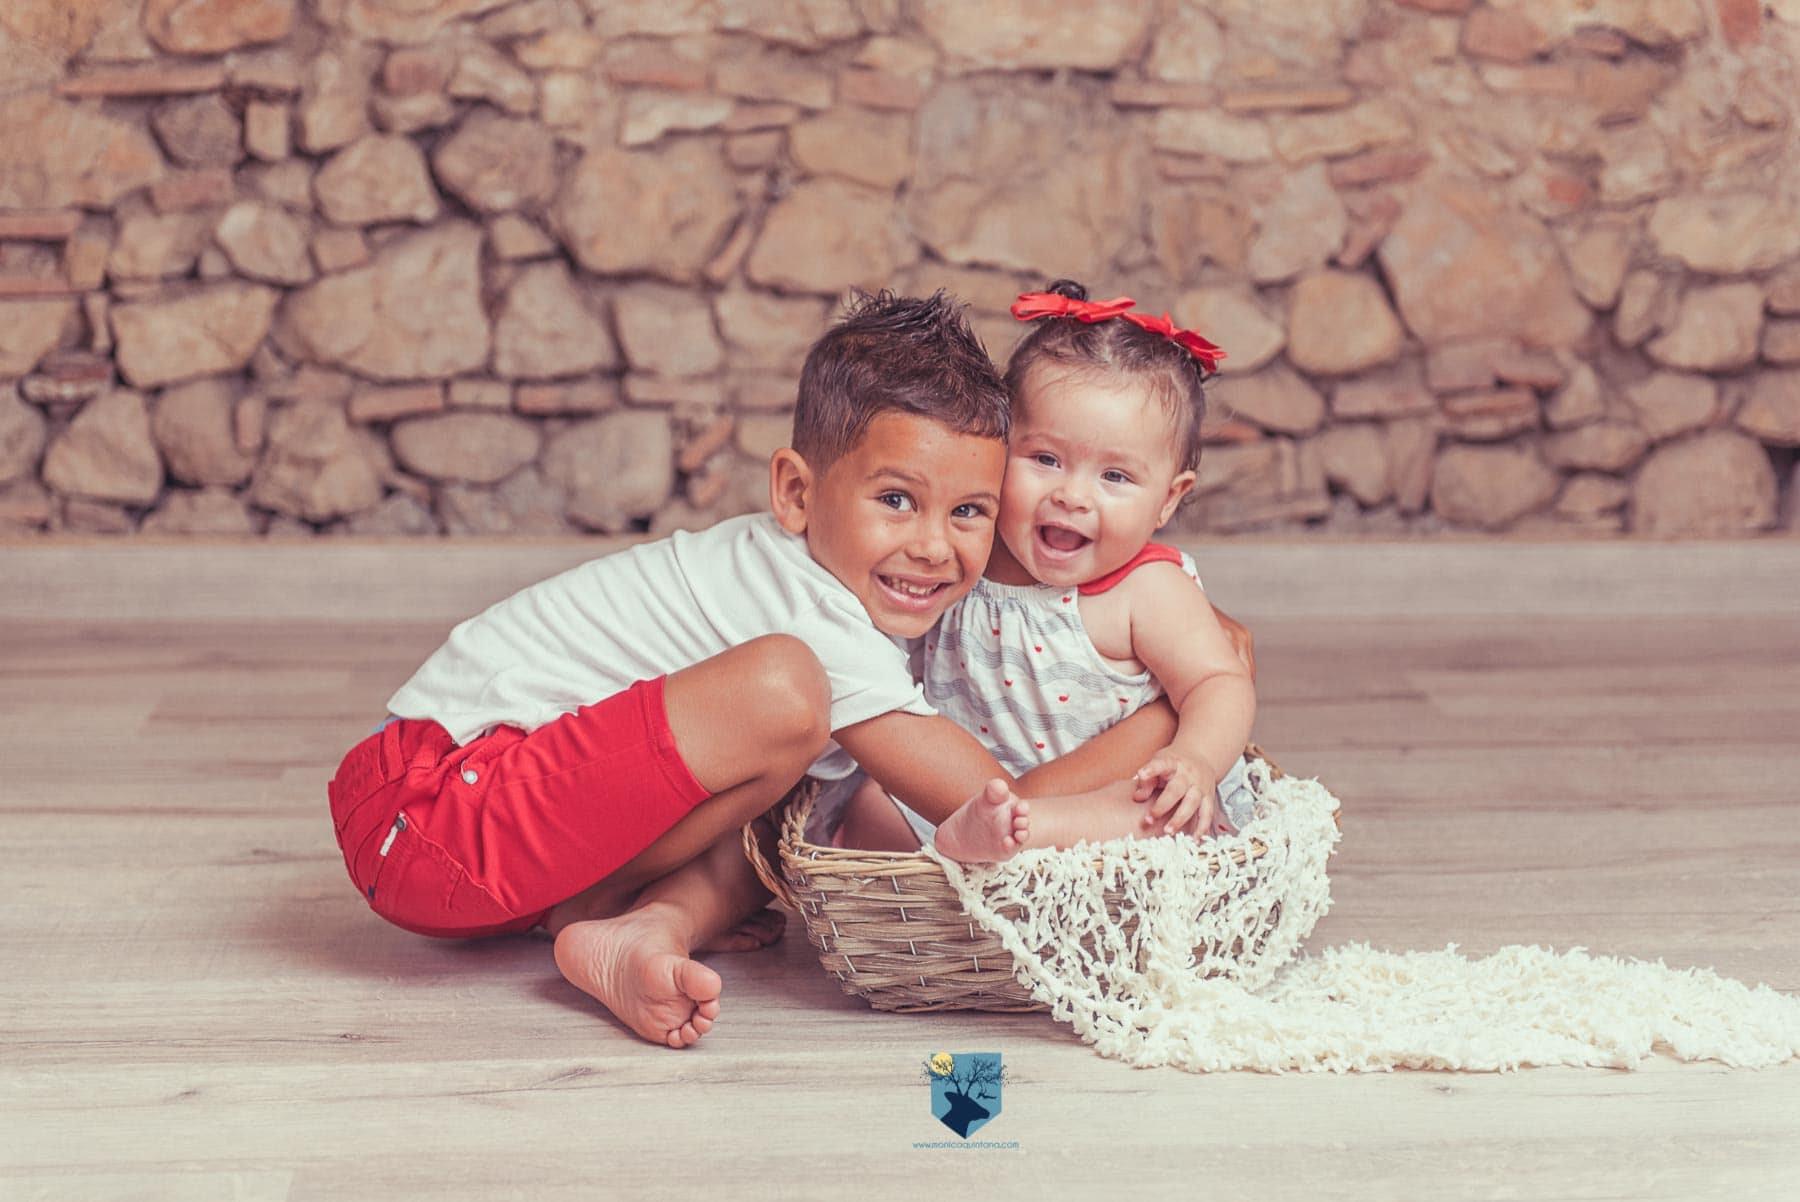 fotografia, fotos, girona, figueres, emporda, monica quintana, fotografa, fotografo, bebes, niños, familia, retrato, estudio, primer año, seis meses, 6 meses, 8 meses